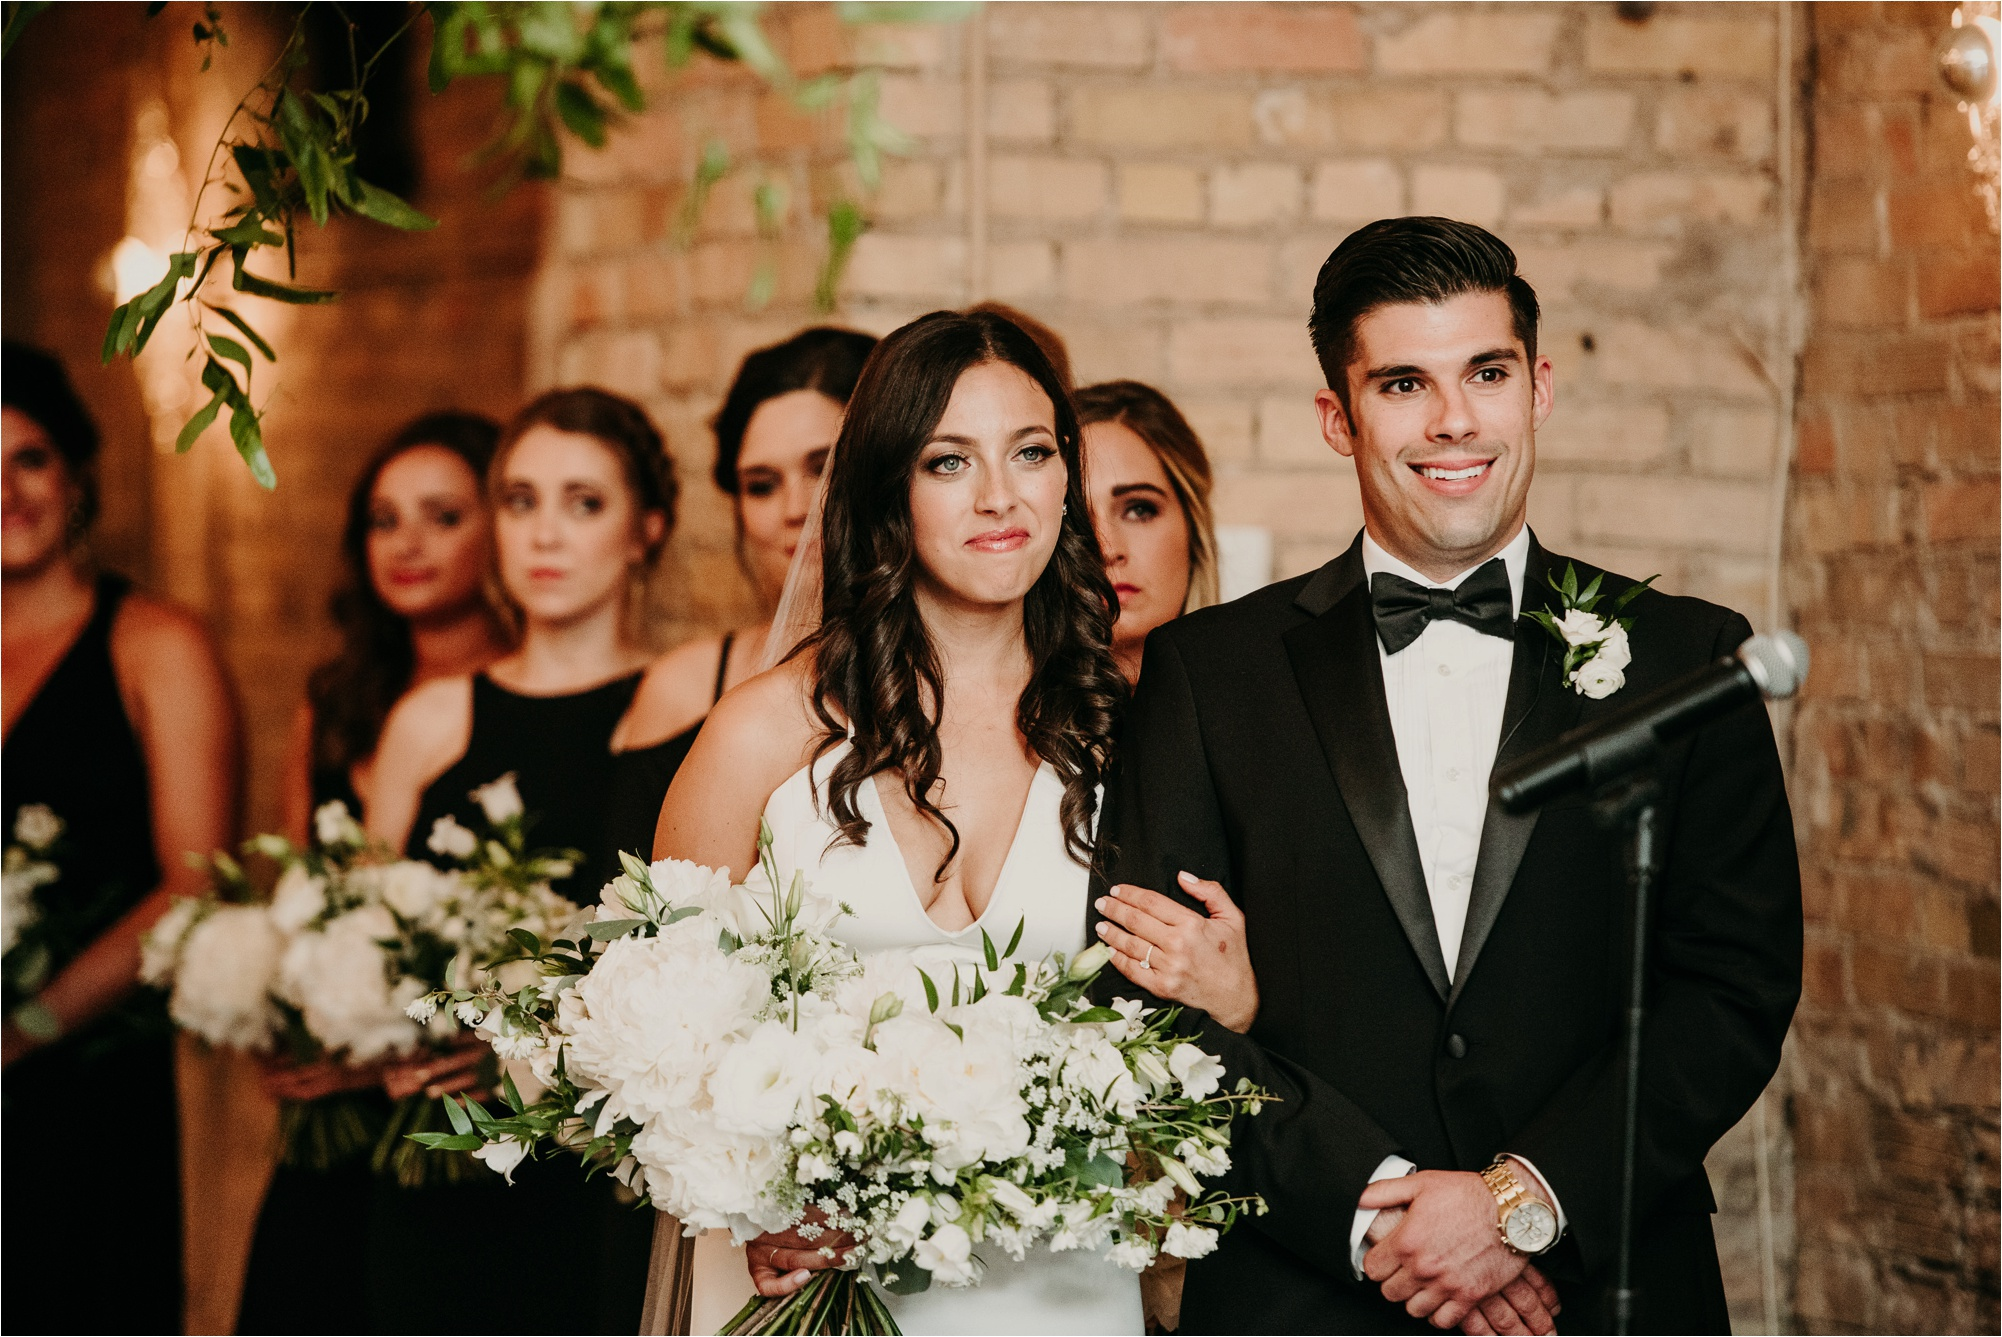 loring social minneapolis wedding ceremony photos